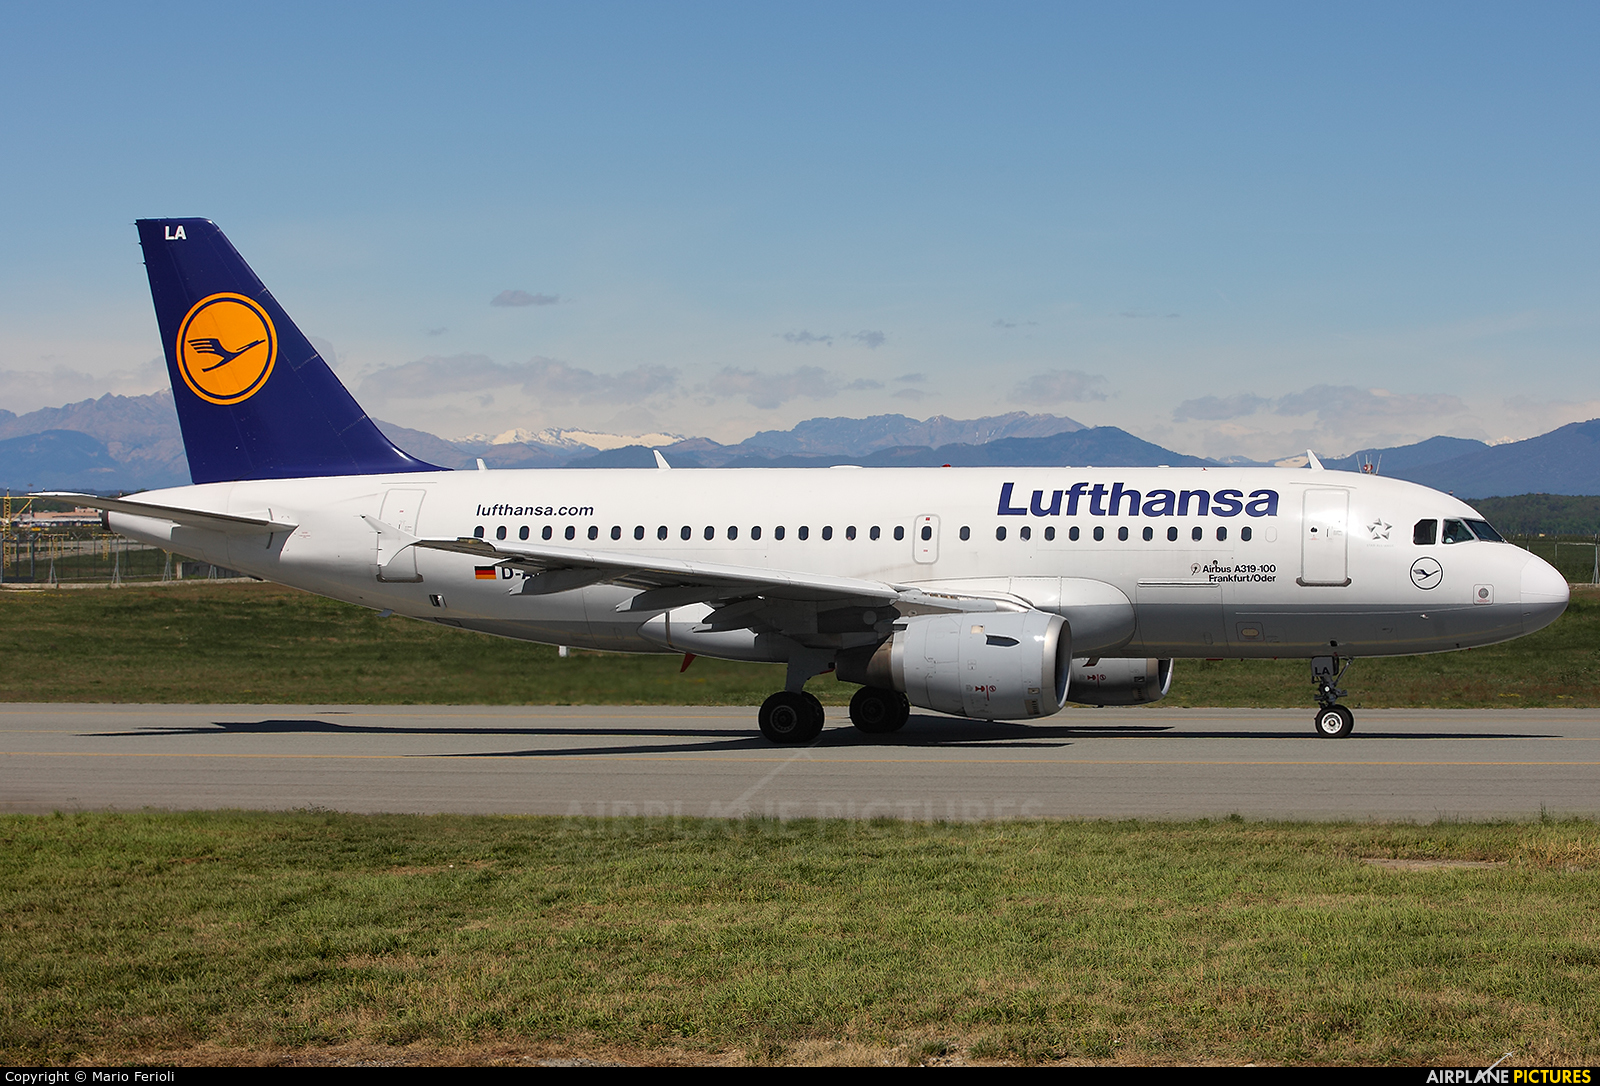 Lufthansa D-AILA aircraft at Milan - Malpensa